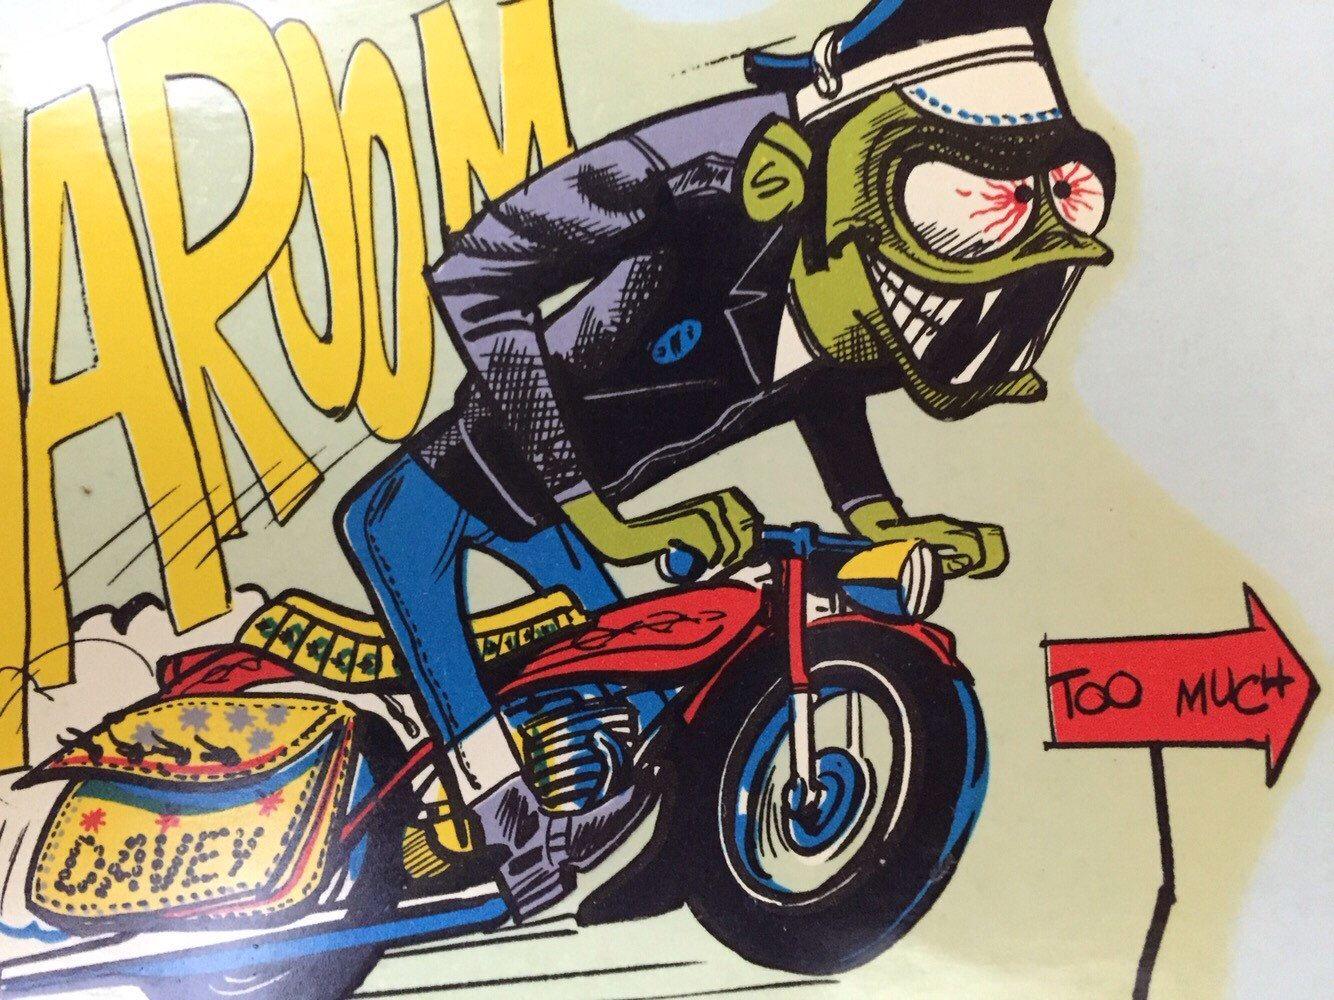 Big bike sticker design - Vintage Weird Ohs Davey Water Decal Rat Fink Kustom Kulture Ed Roth